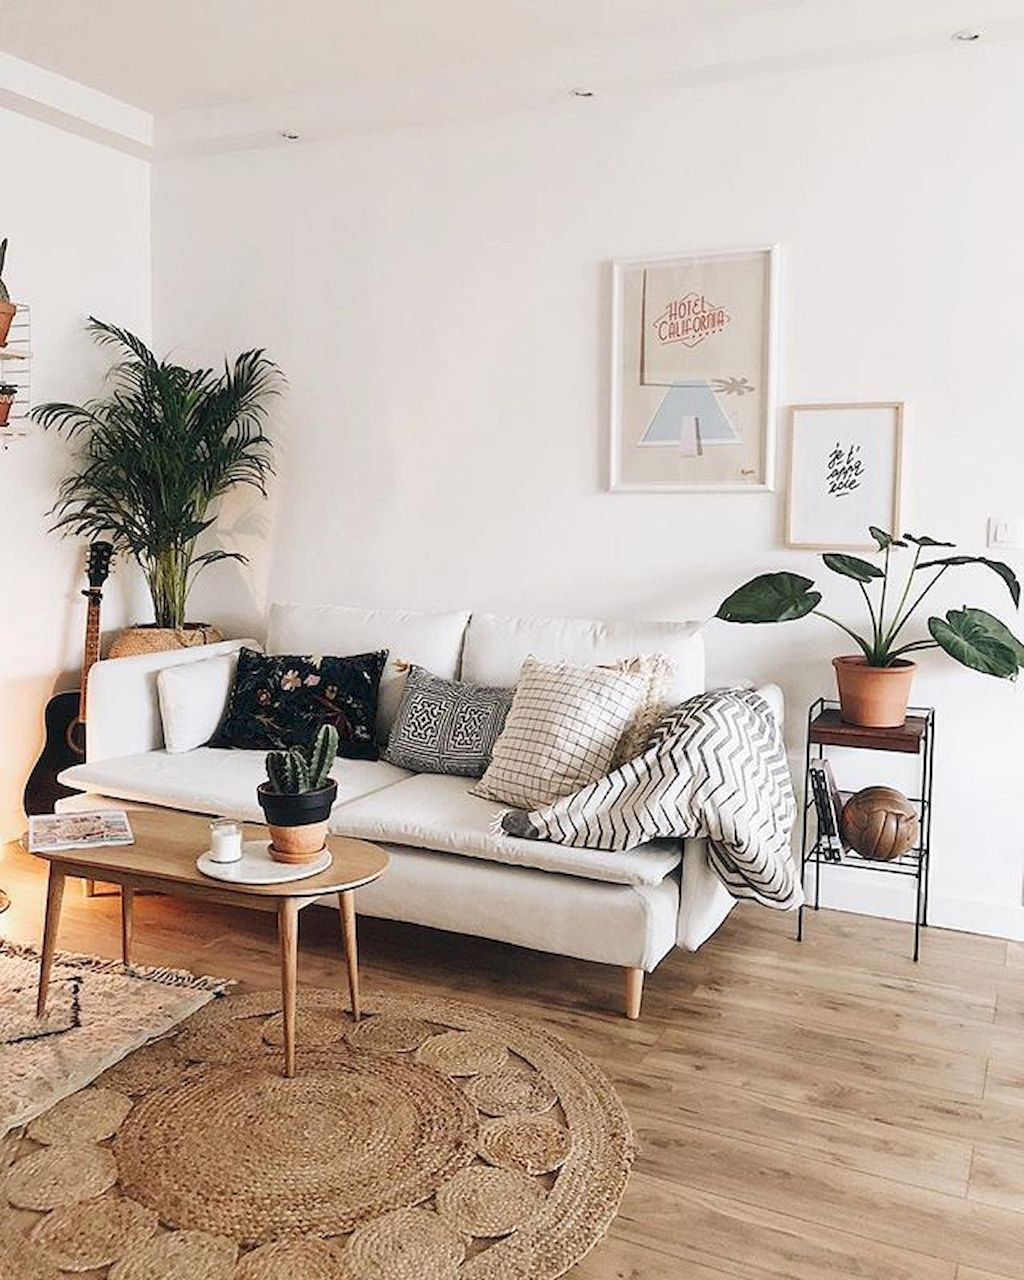 65 modern bohemian living room decor ideas minimalist on home interior design ideas id=38373